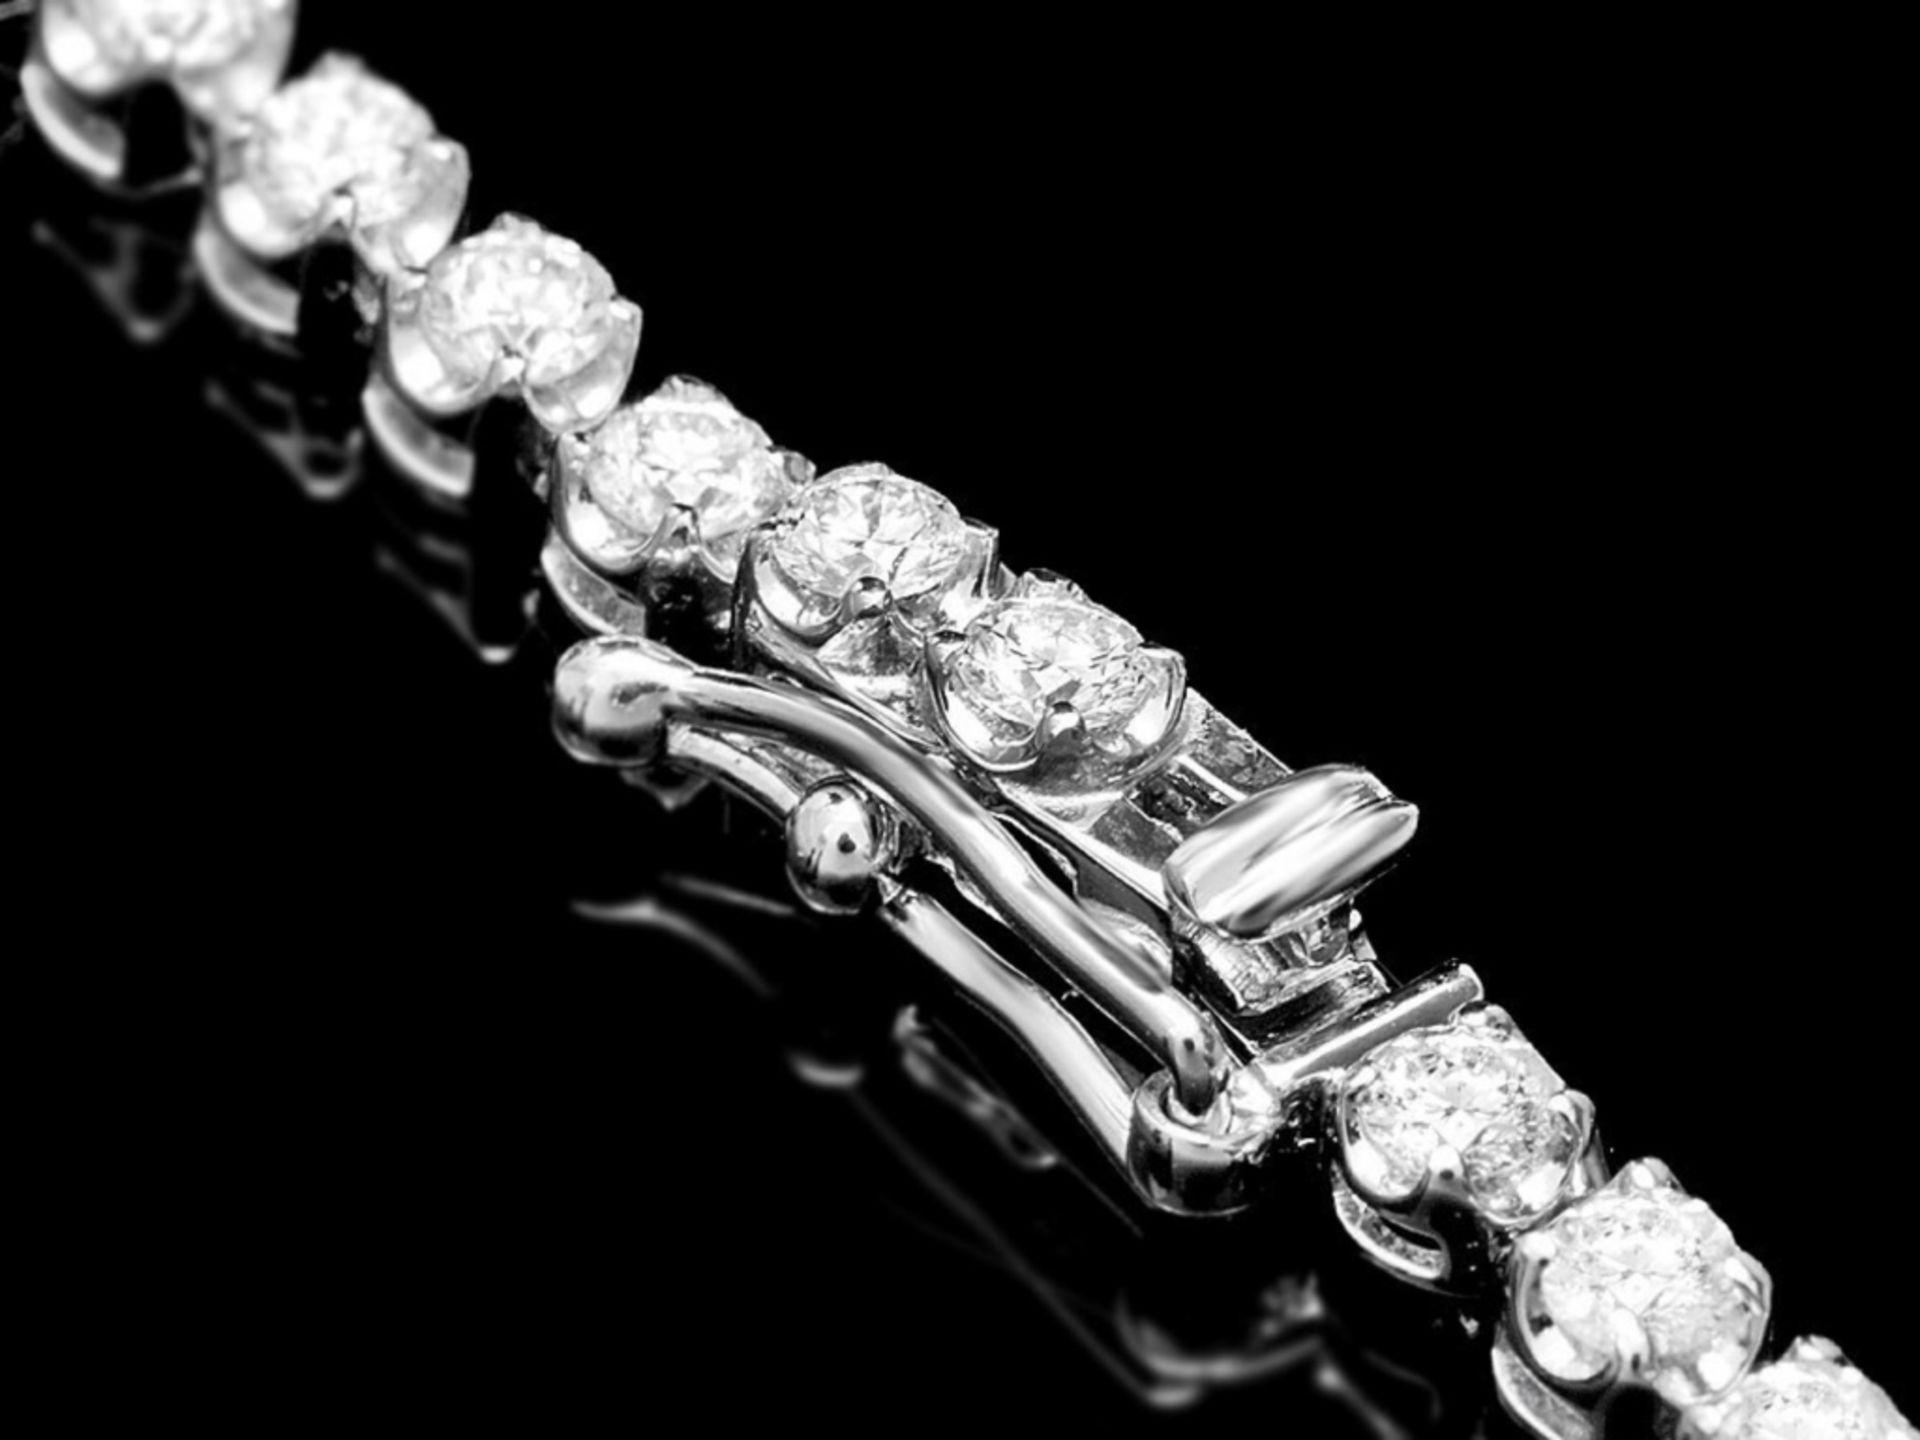 ^18k White Gold 6.50ct Diamond Necklace - Image 2 of 3